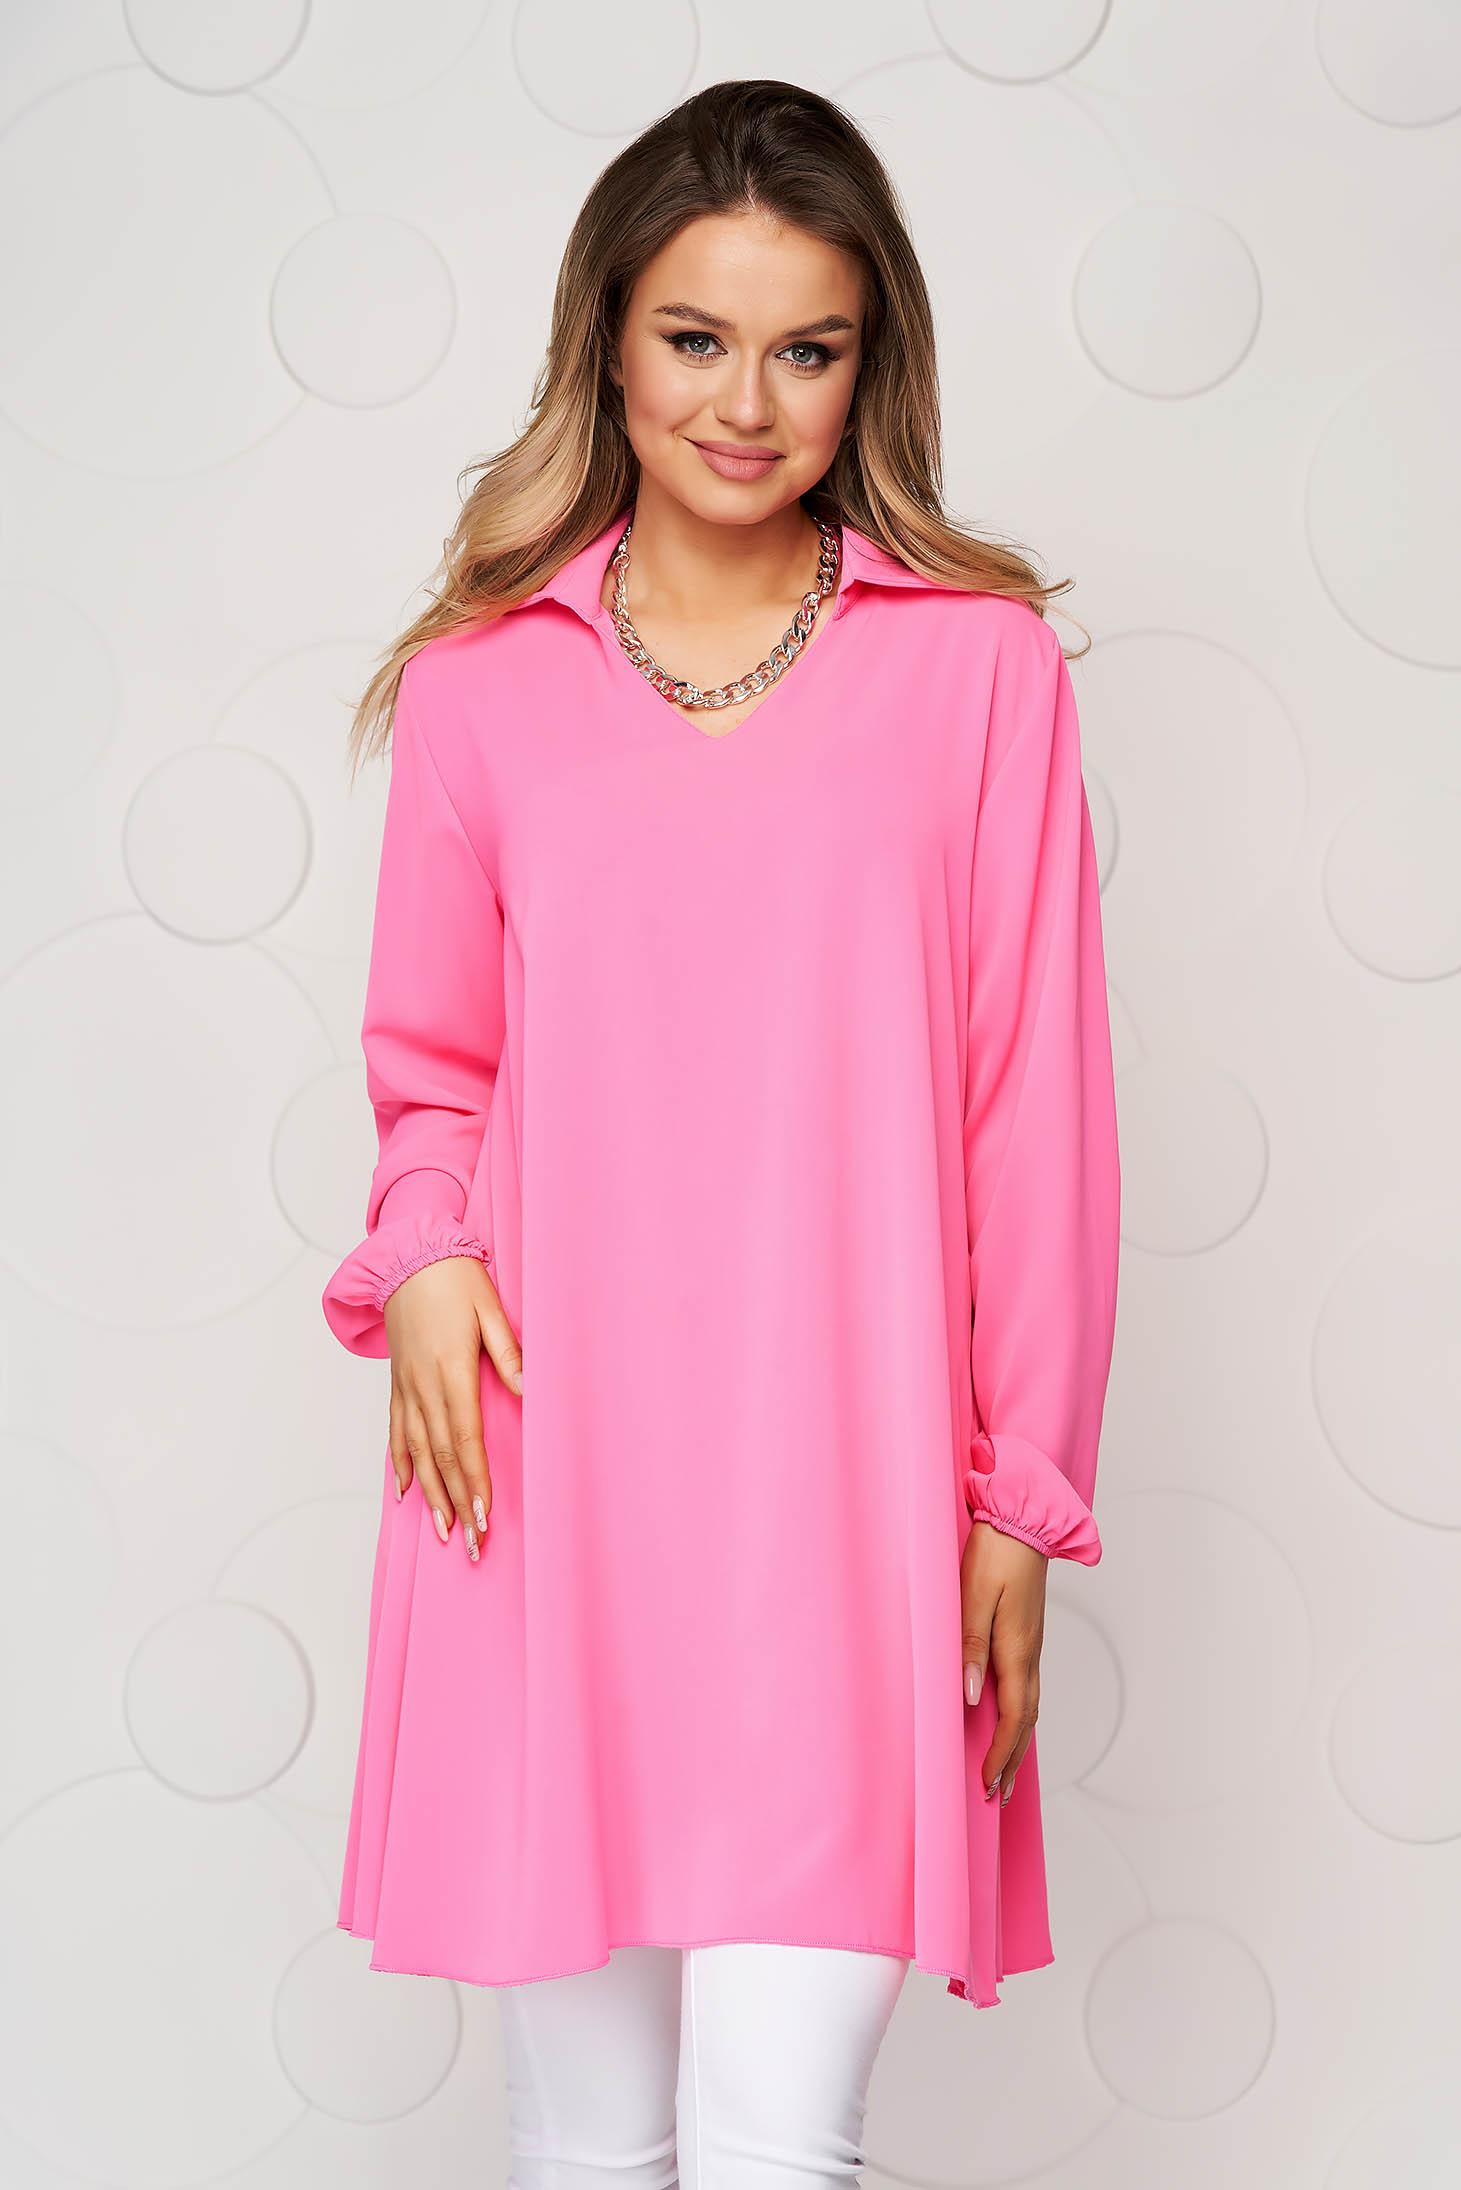 Bluza dama SunShine roz cu croi larg din material vaporos si transparent cu maneca lunga